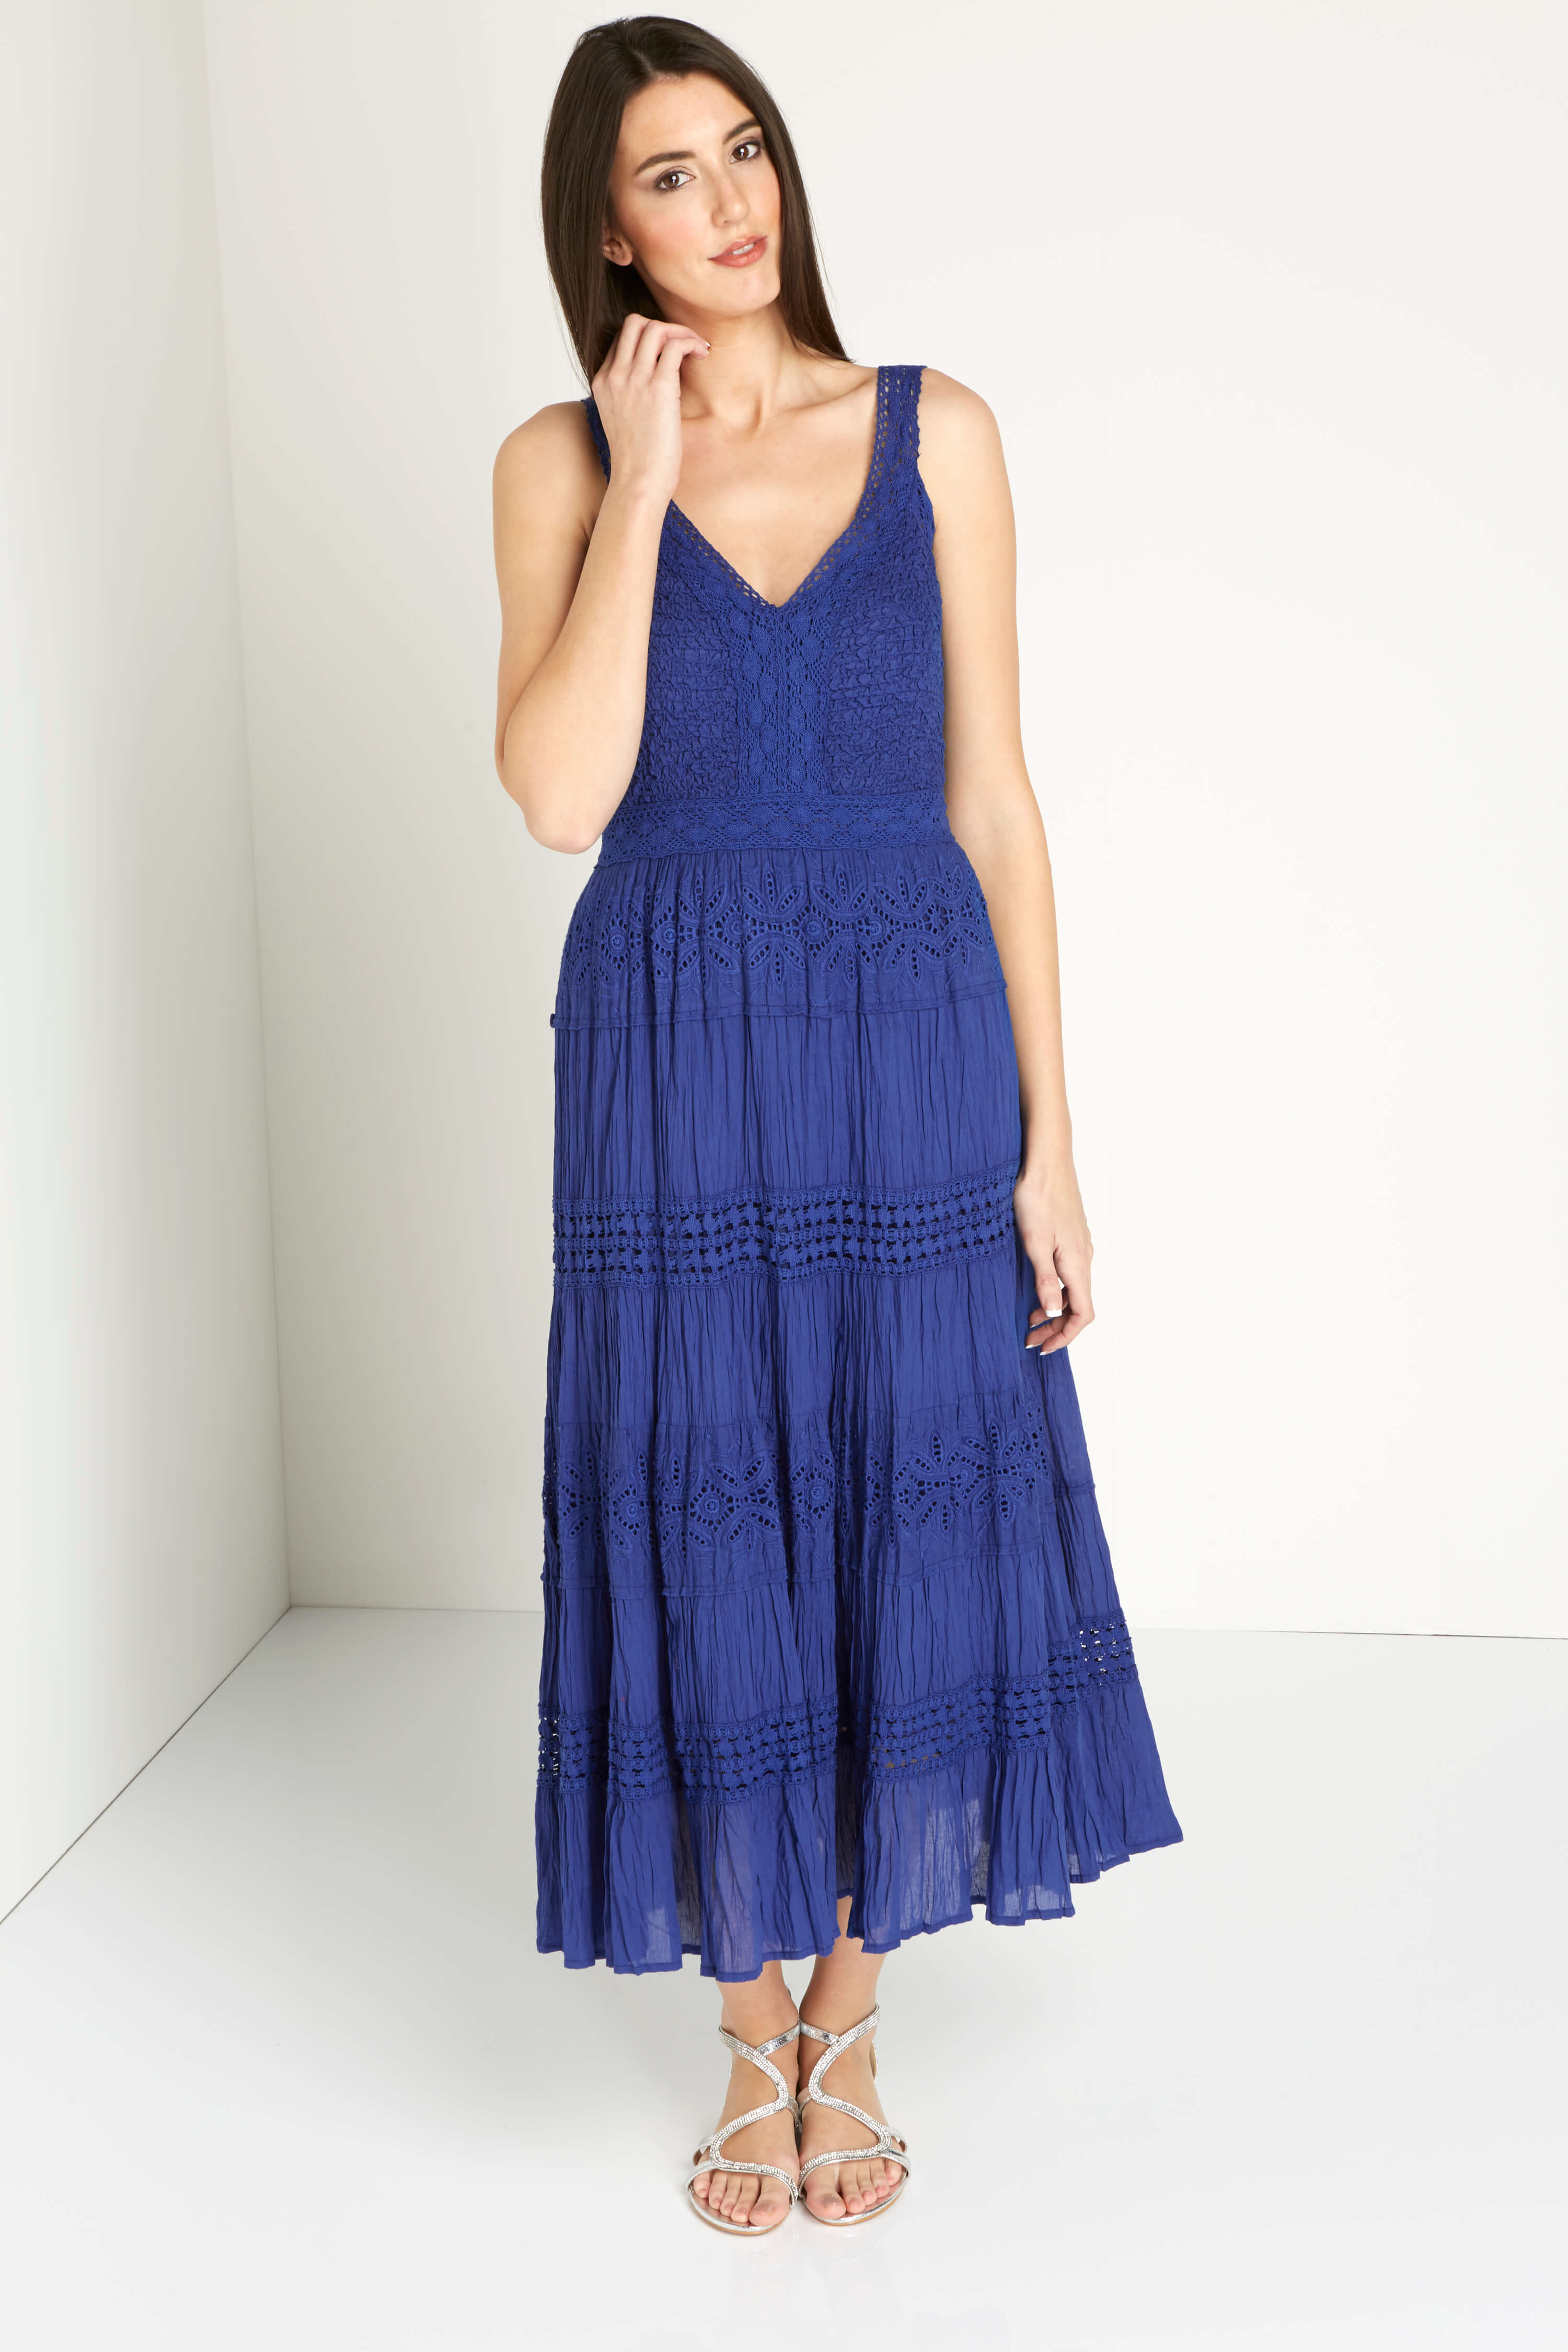 Roman Originals 100% Cotton Summer Maxi Dress in Royal Blue